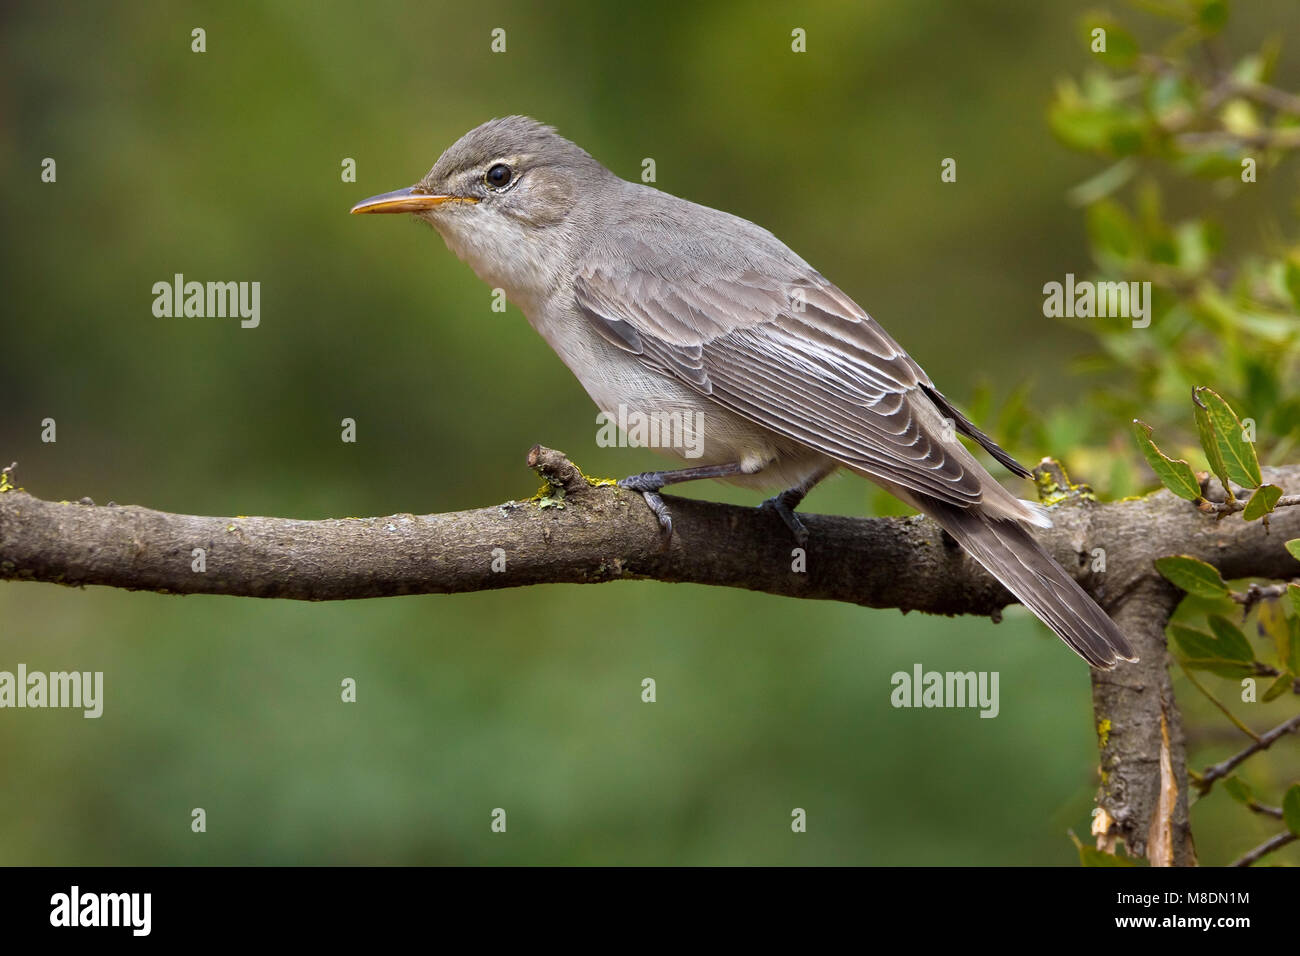 Griekse Spotvogel zittend op tak; Olive-tree Warbler perched on branch Stock Photo